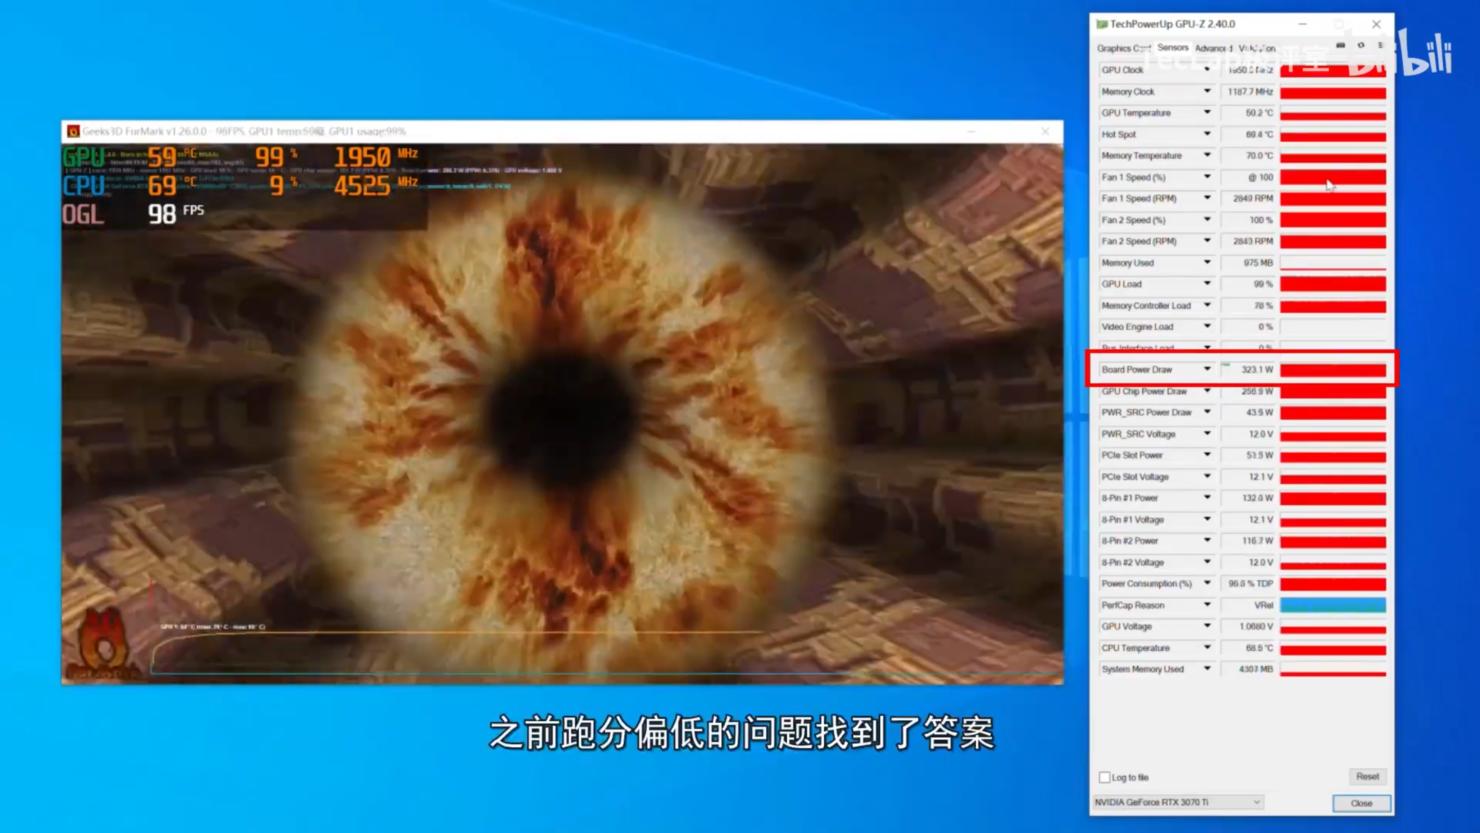 nvidia-geforce-rtx-3070-ti-graphics-card-benchmark-performance-leak-_2